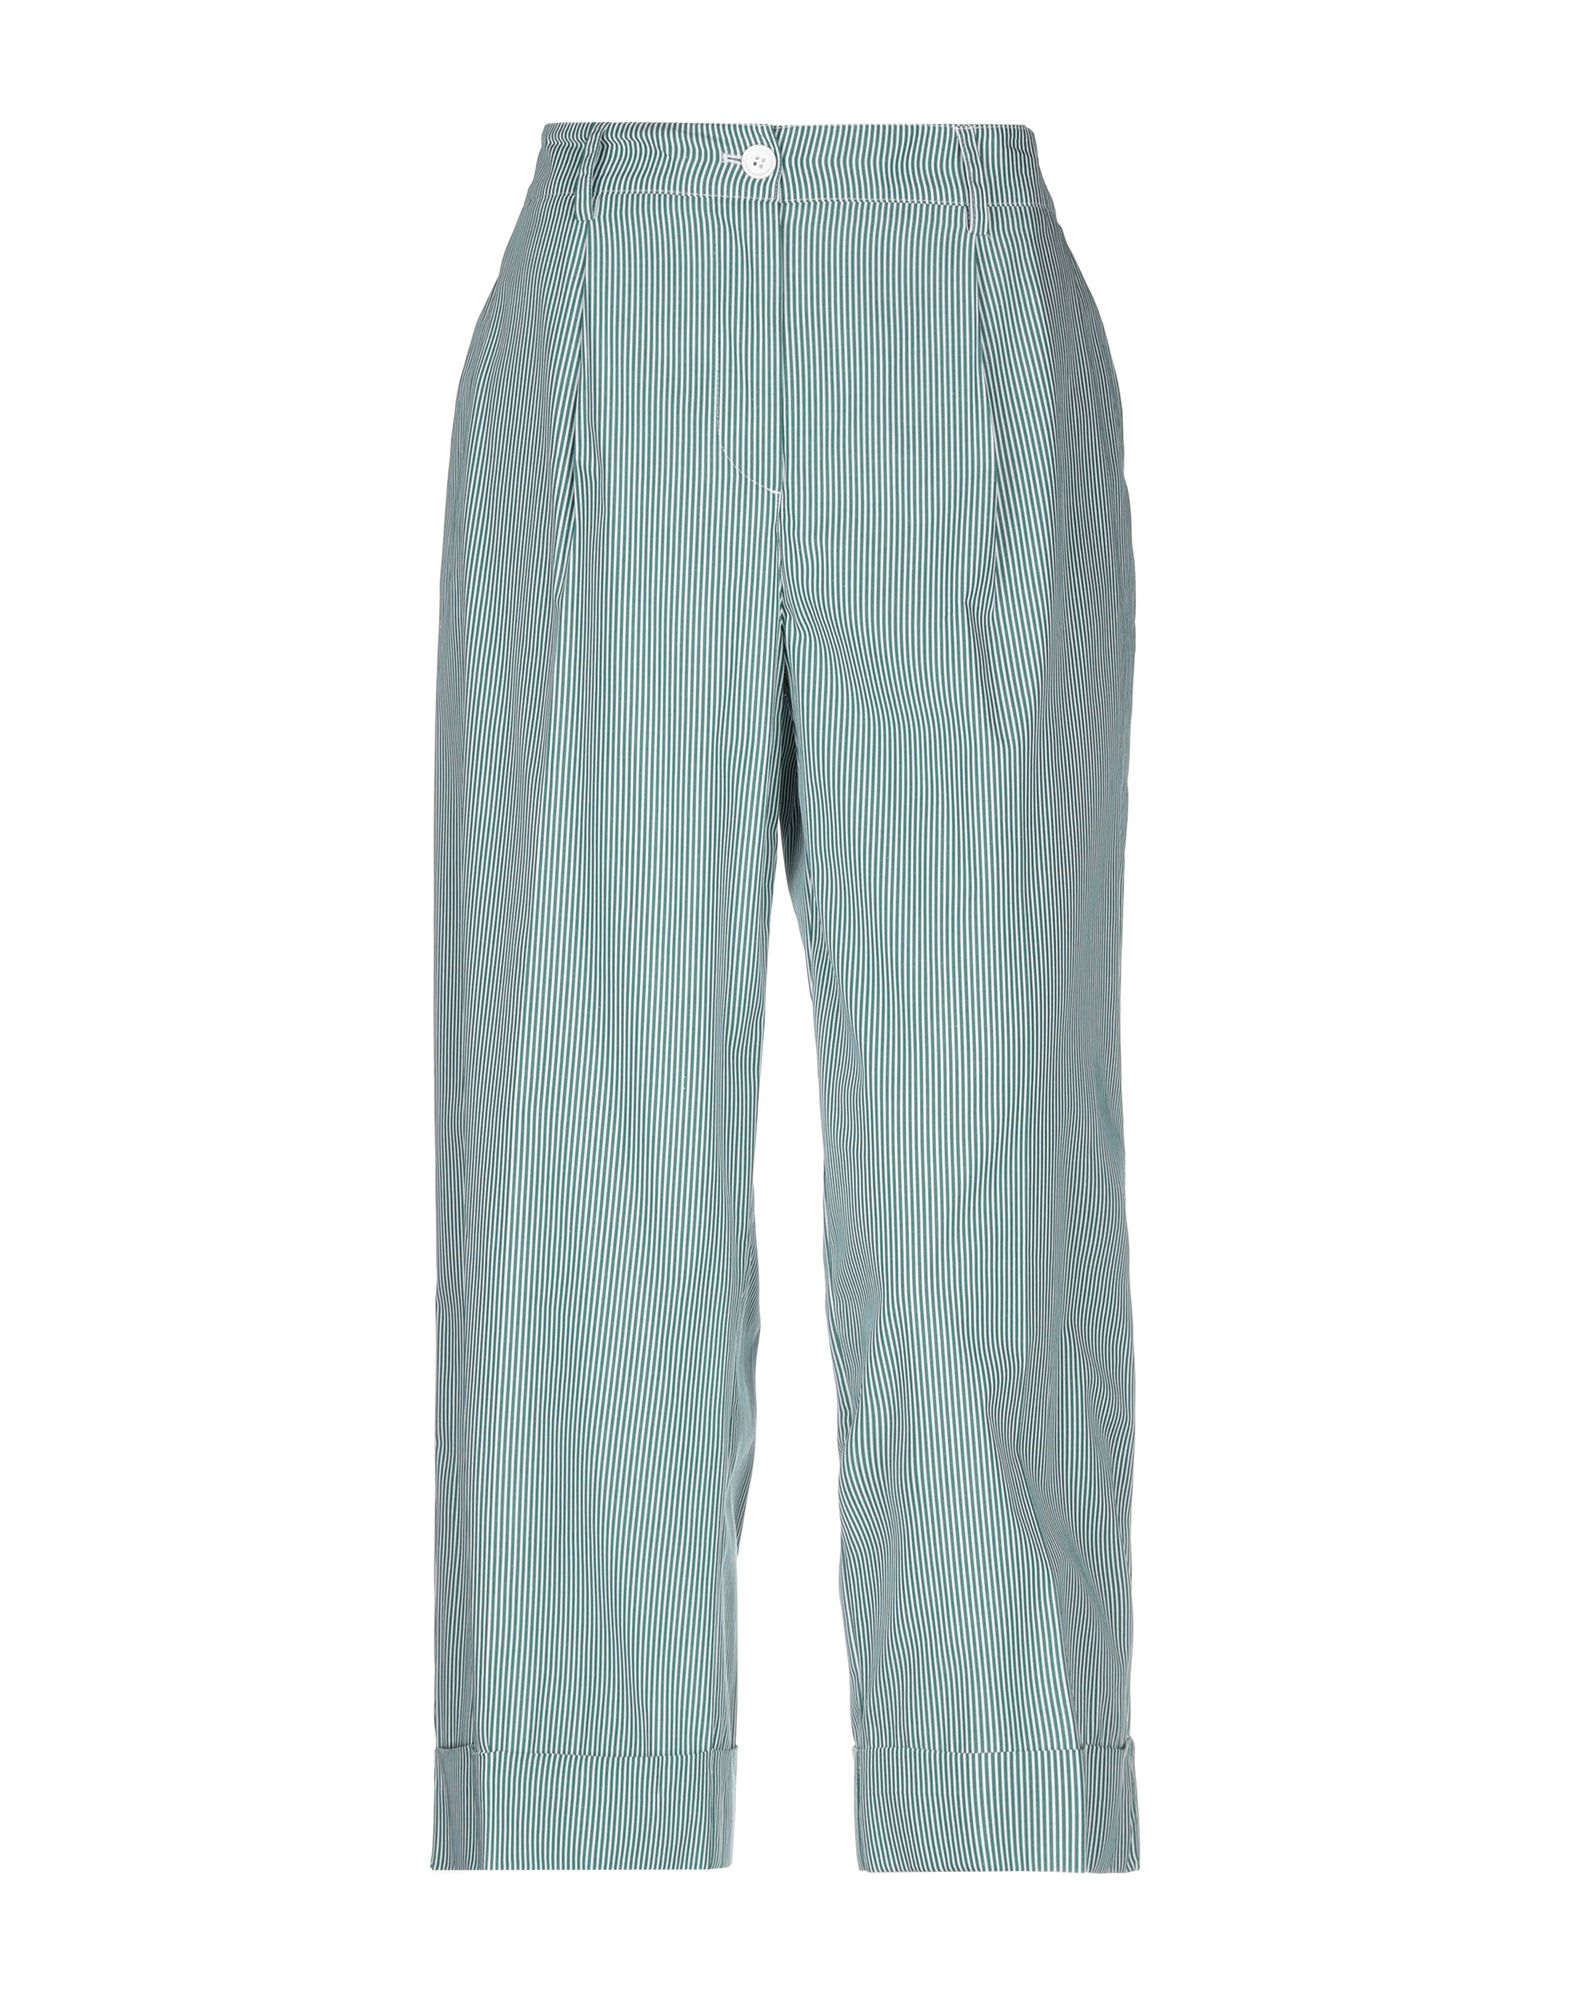 P.A.R.O.S.H. Повседневные брюки bonheur повседневные брюки